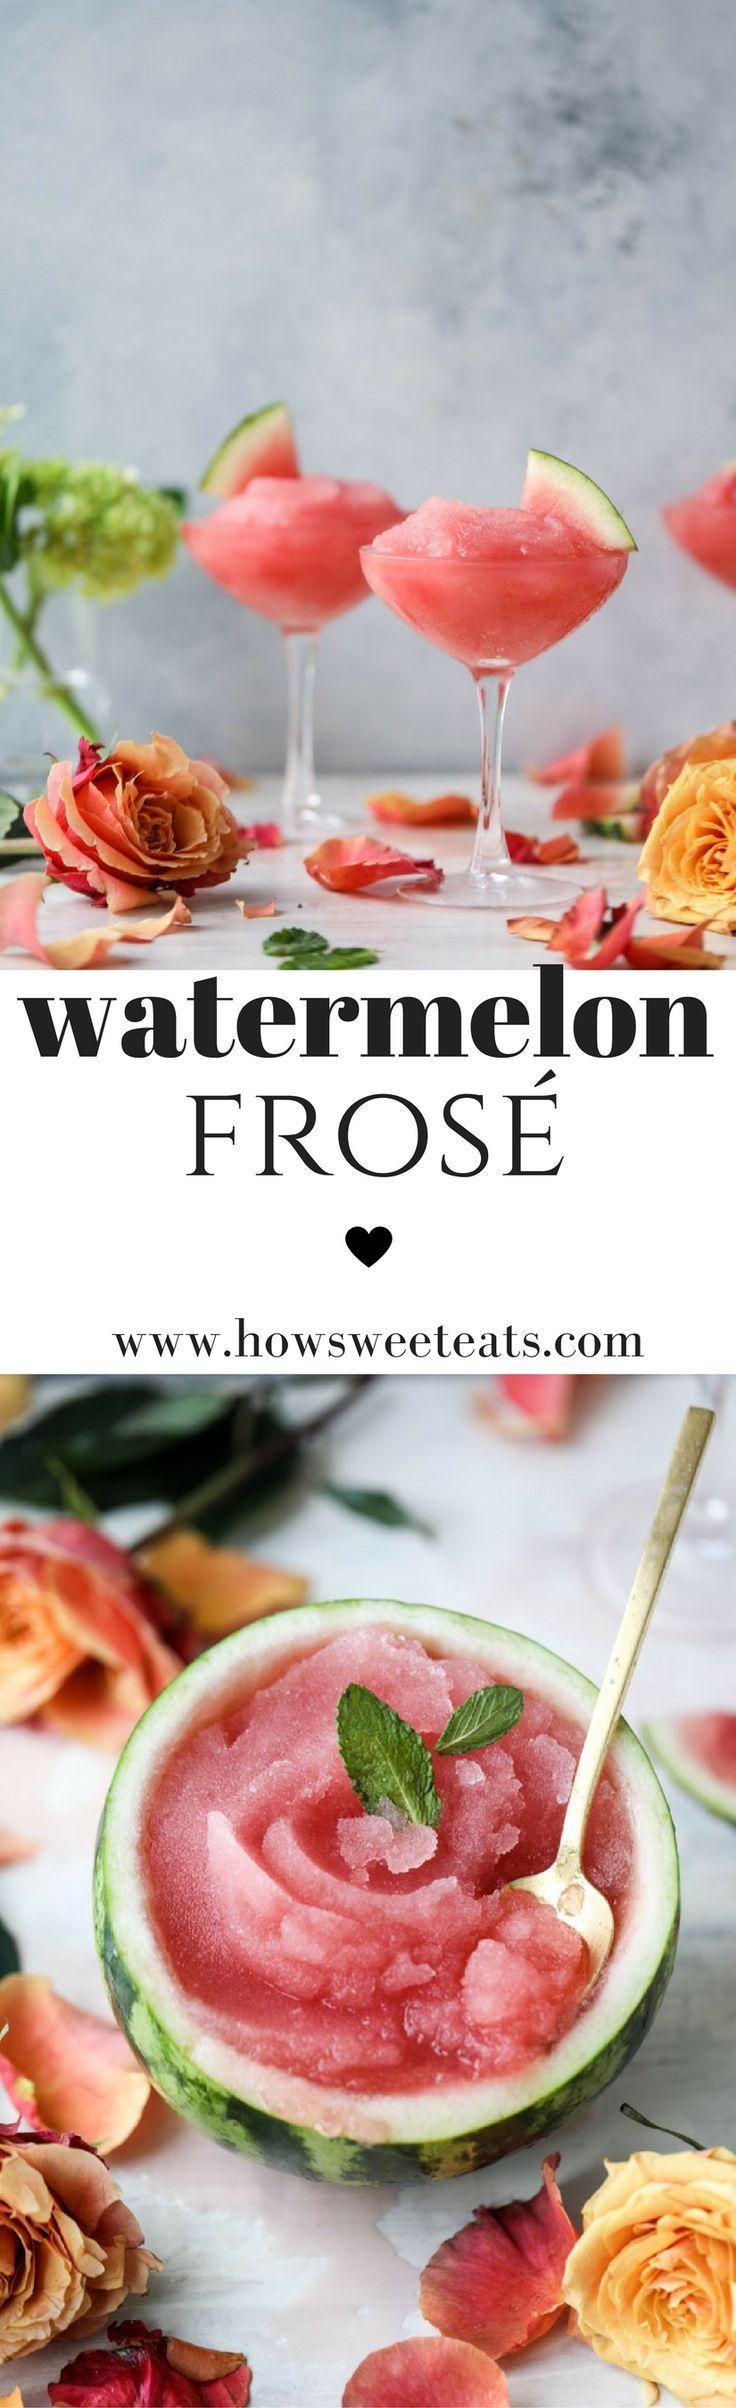 Watermelon Frosé- aka, FROZEN ROSE! your best summer cocktail. I howsweeteats.com